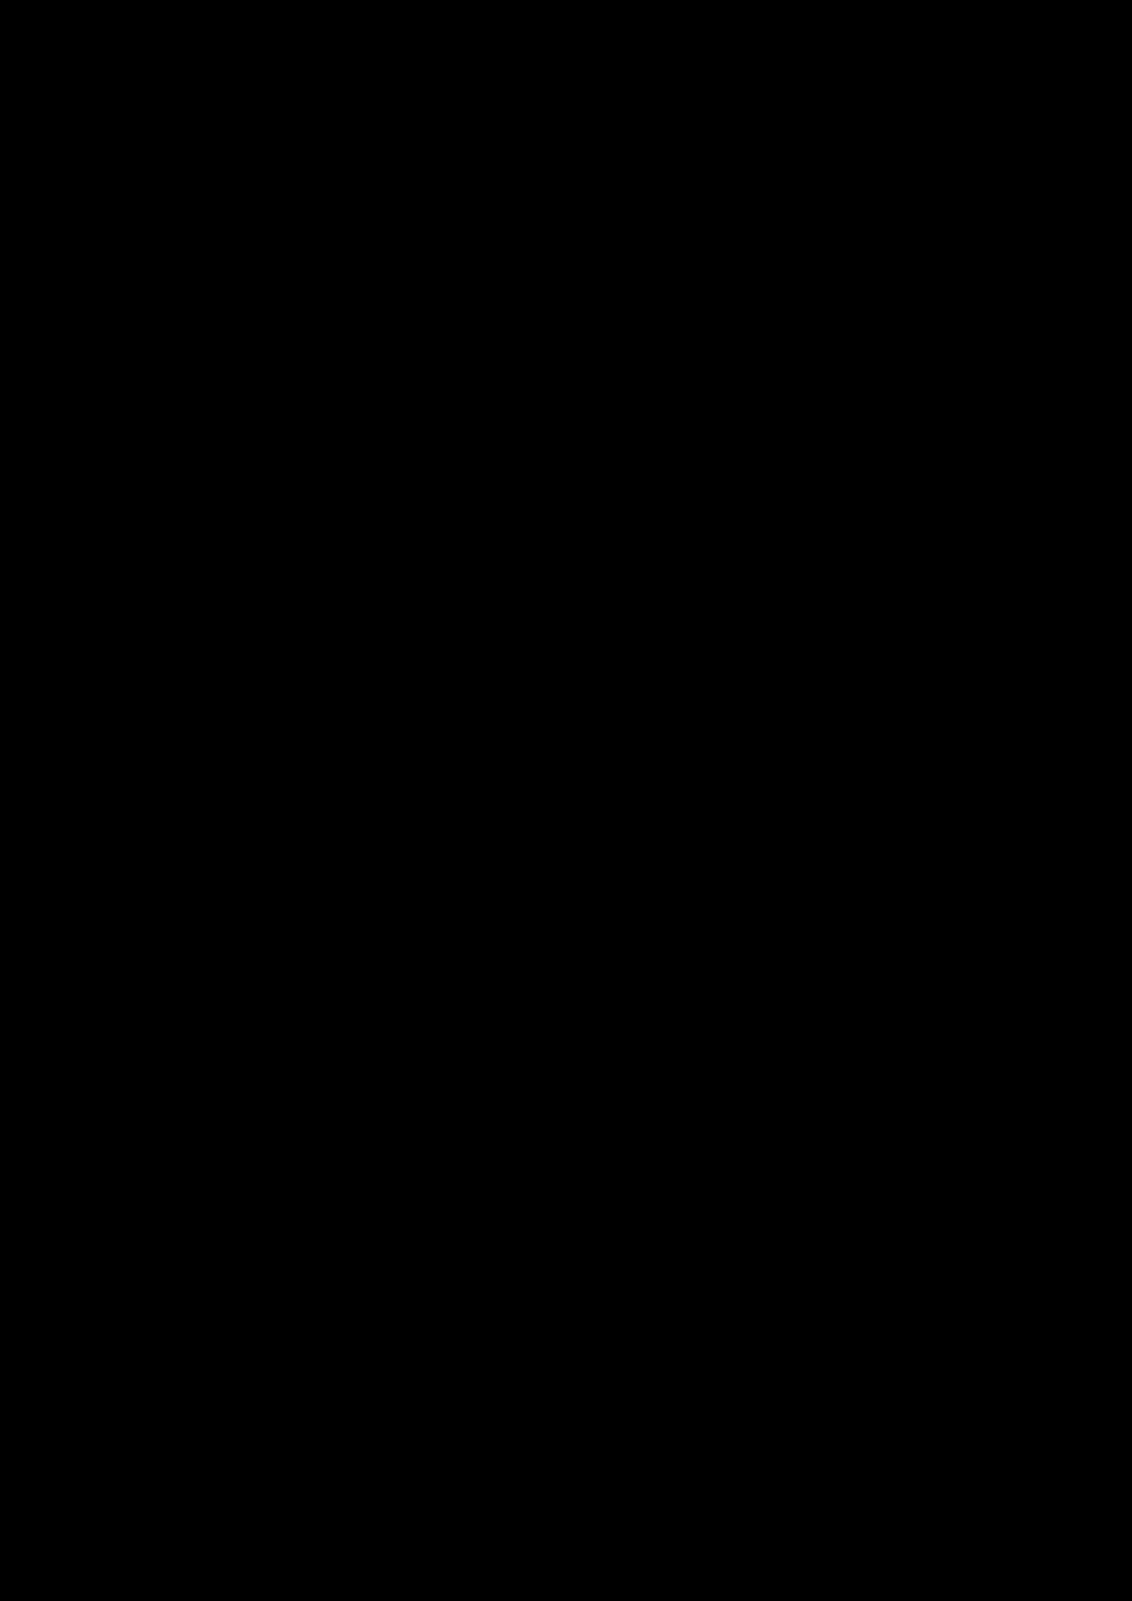 Korolevstvo slez slide, Image 22